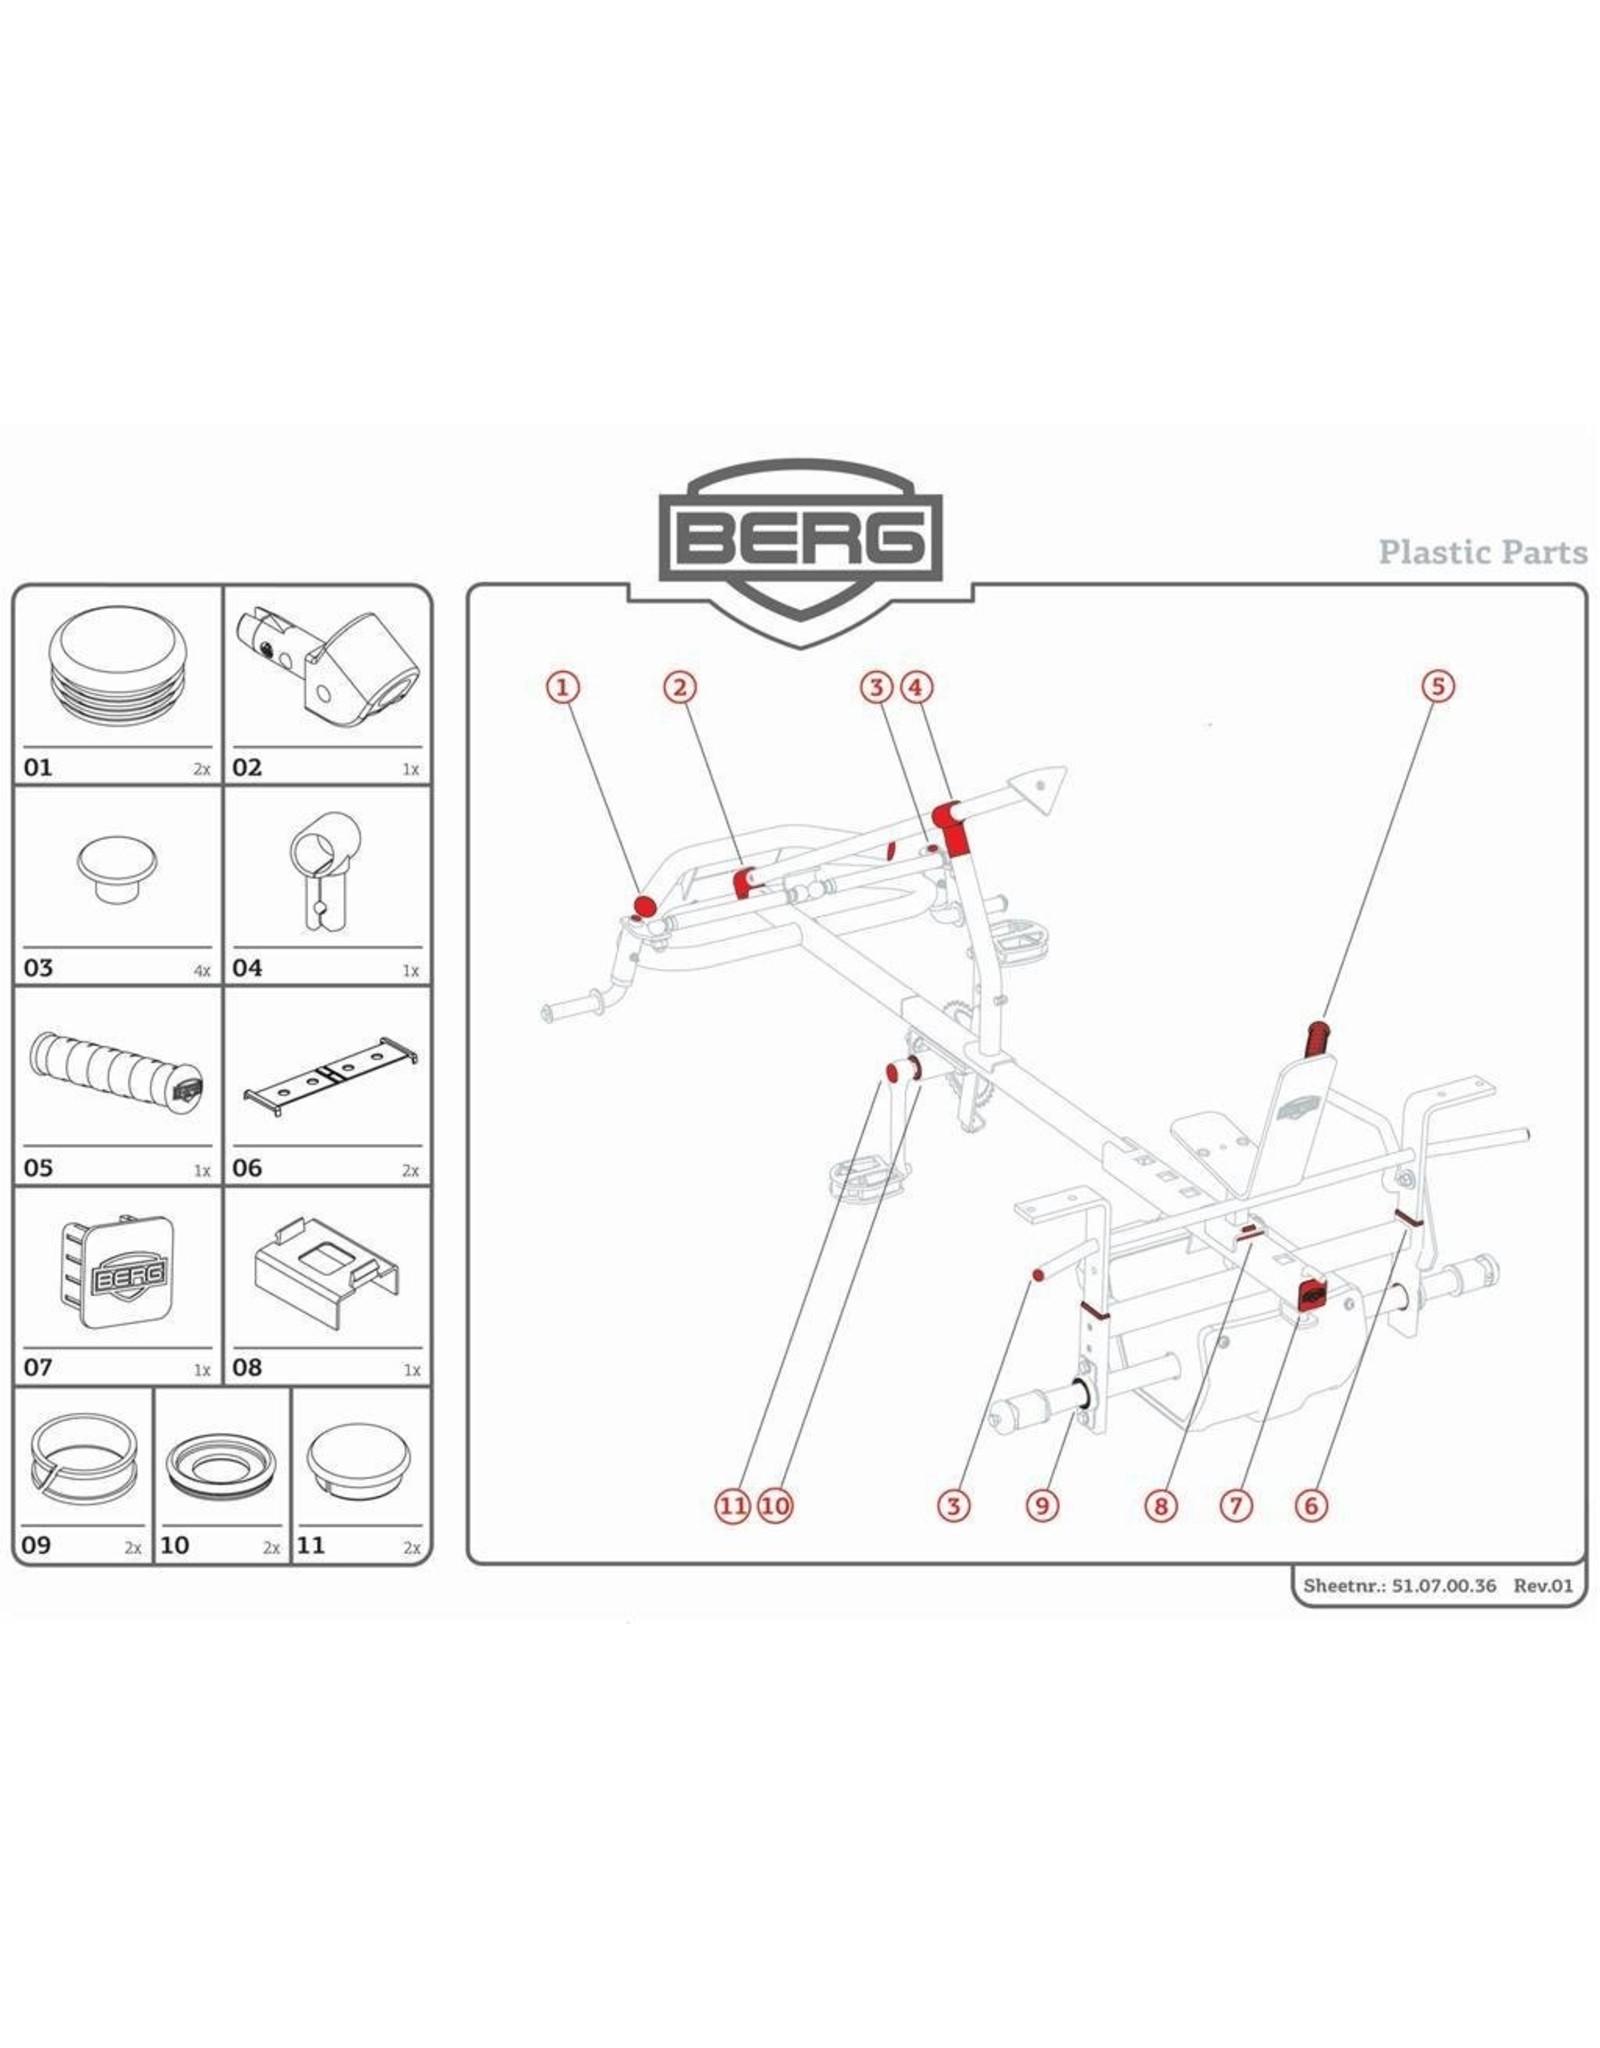 BERG BERG XL Rahmen - Kunststoffteileset